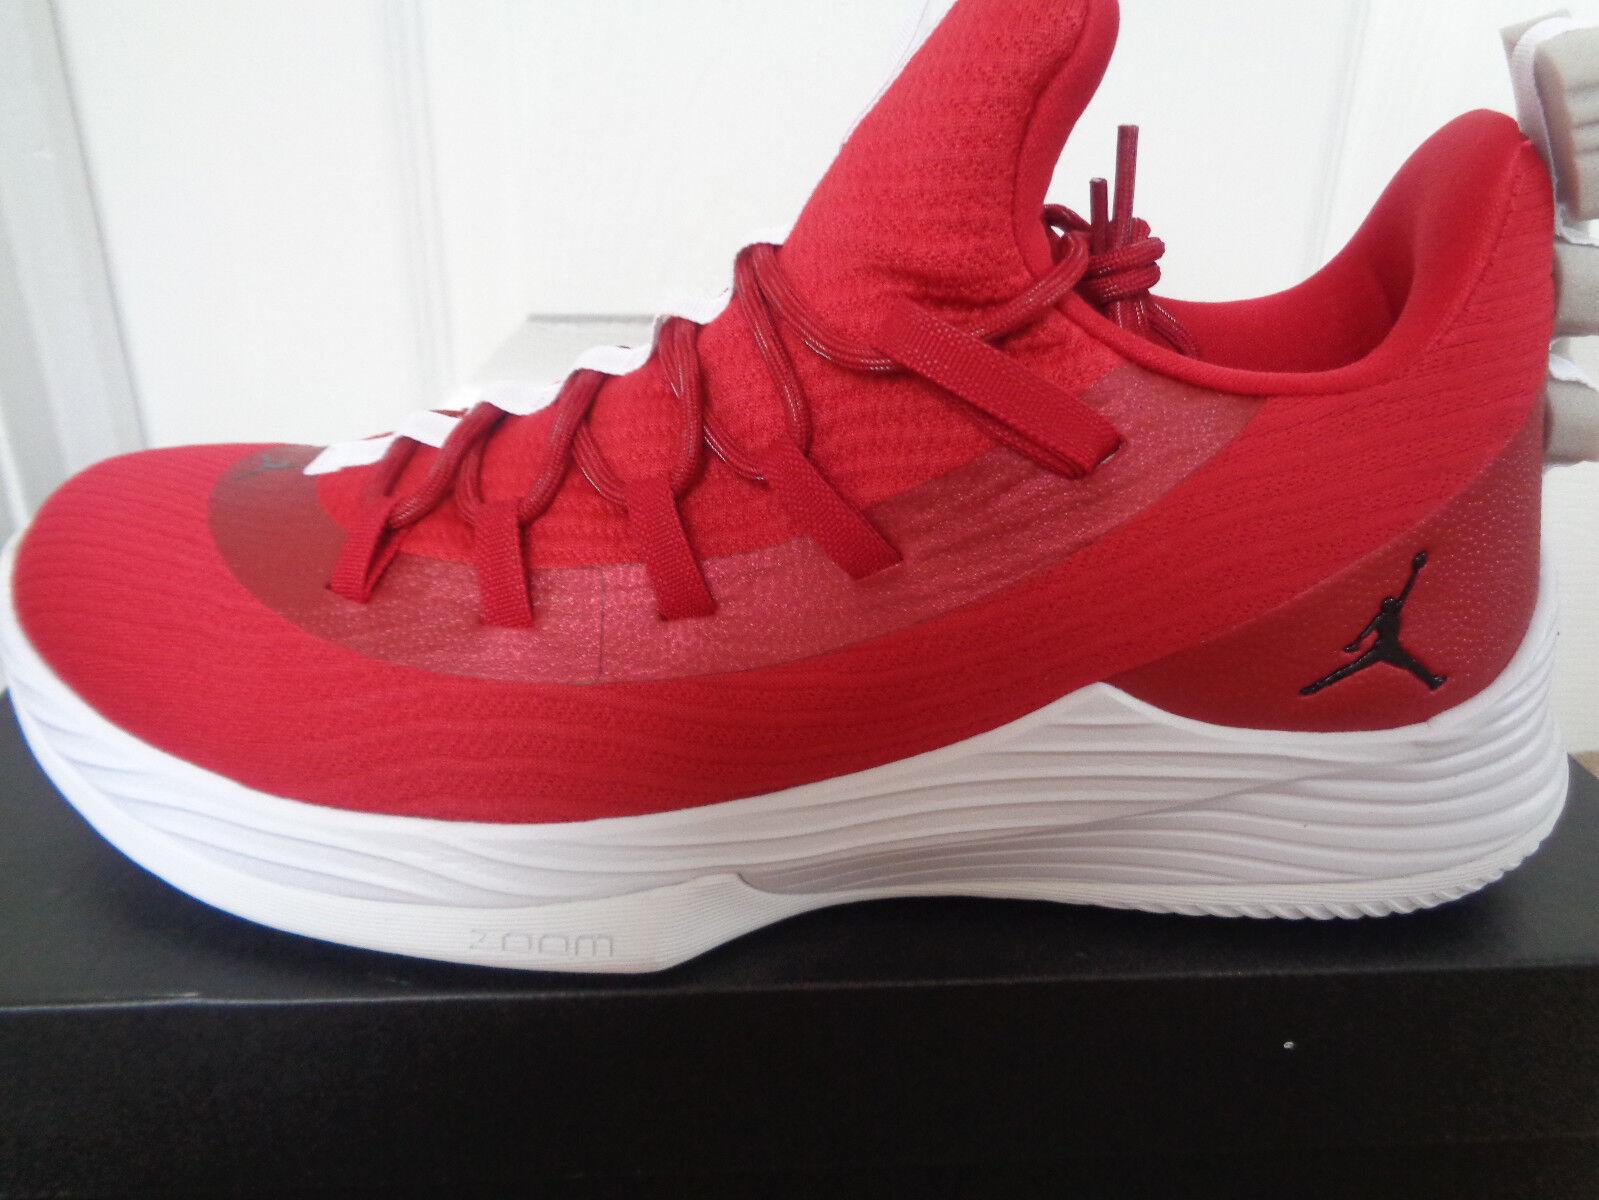 Nike Jordan Ultra Fly 2 Low trainers shoes AH8110 601 eu 46 us 12 NEW+BOX